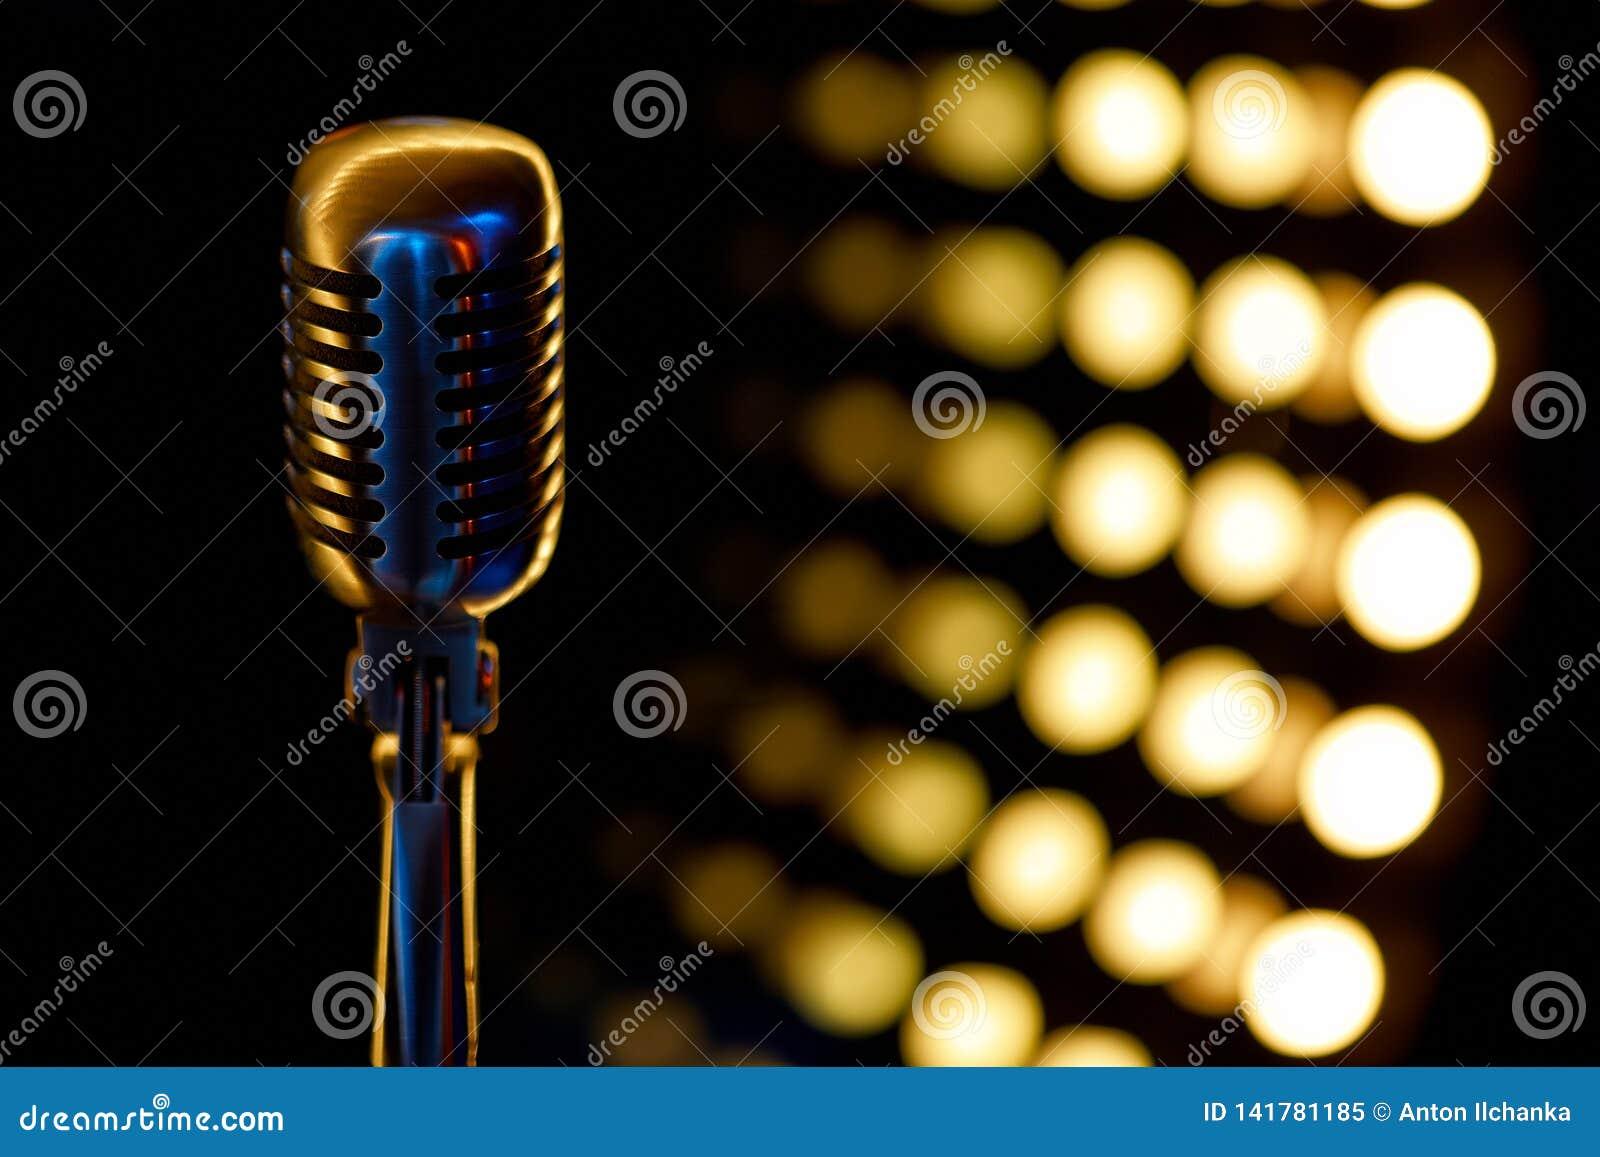 Uitstekende microfoon met kleurenachtergrond in nachtclub